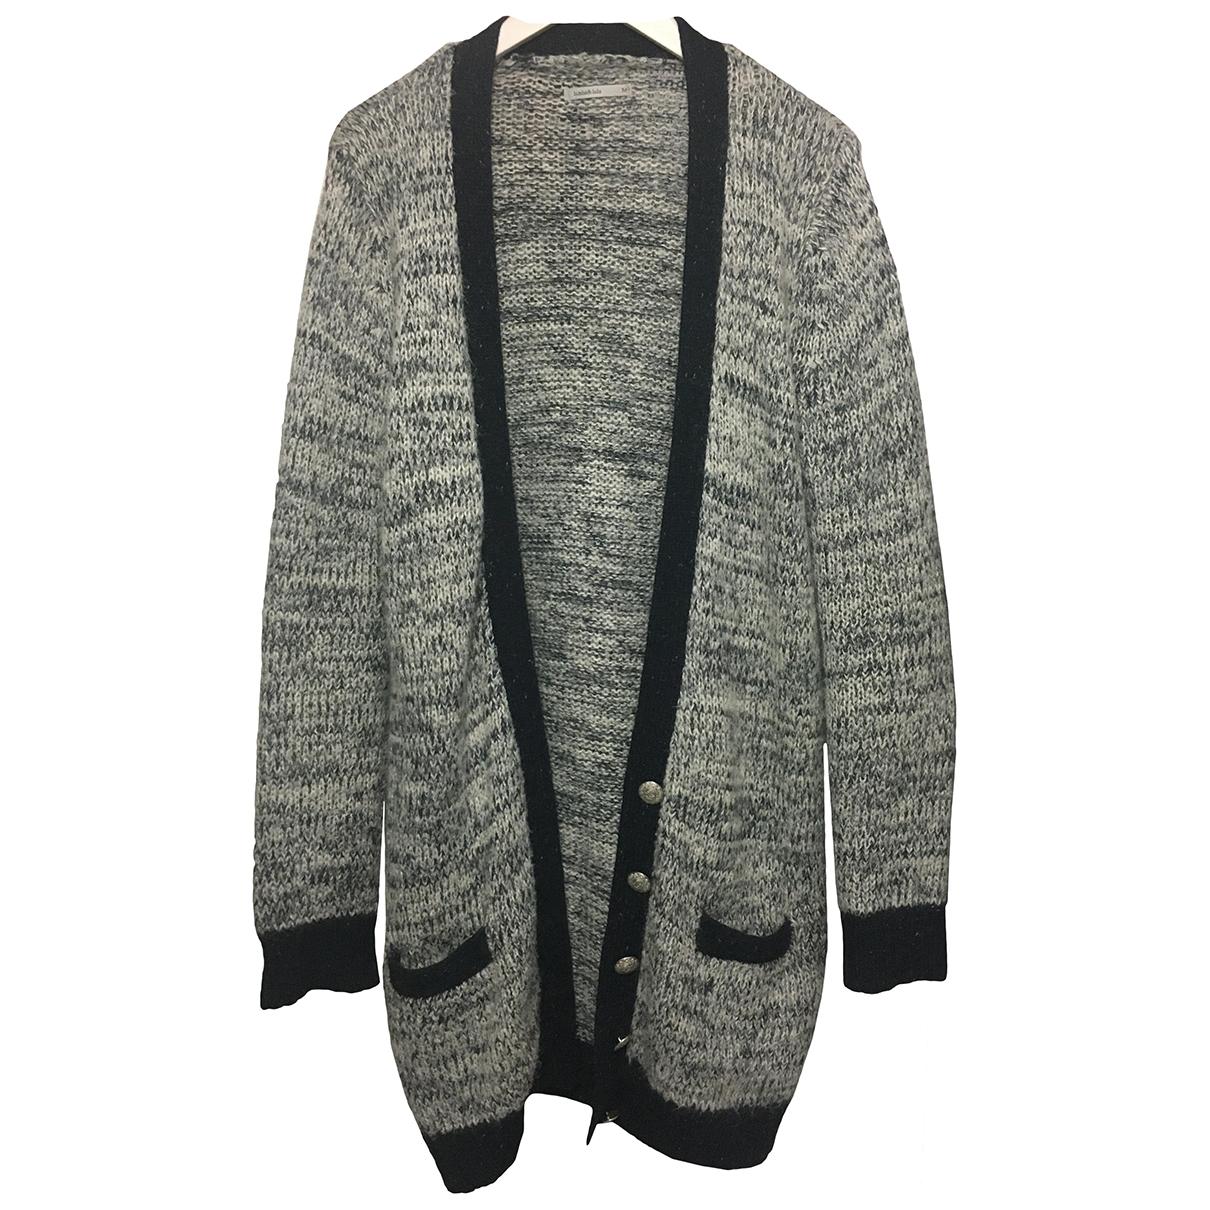 Bimba Y Lola \N Grey Cotton jacket for Women M International